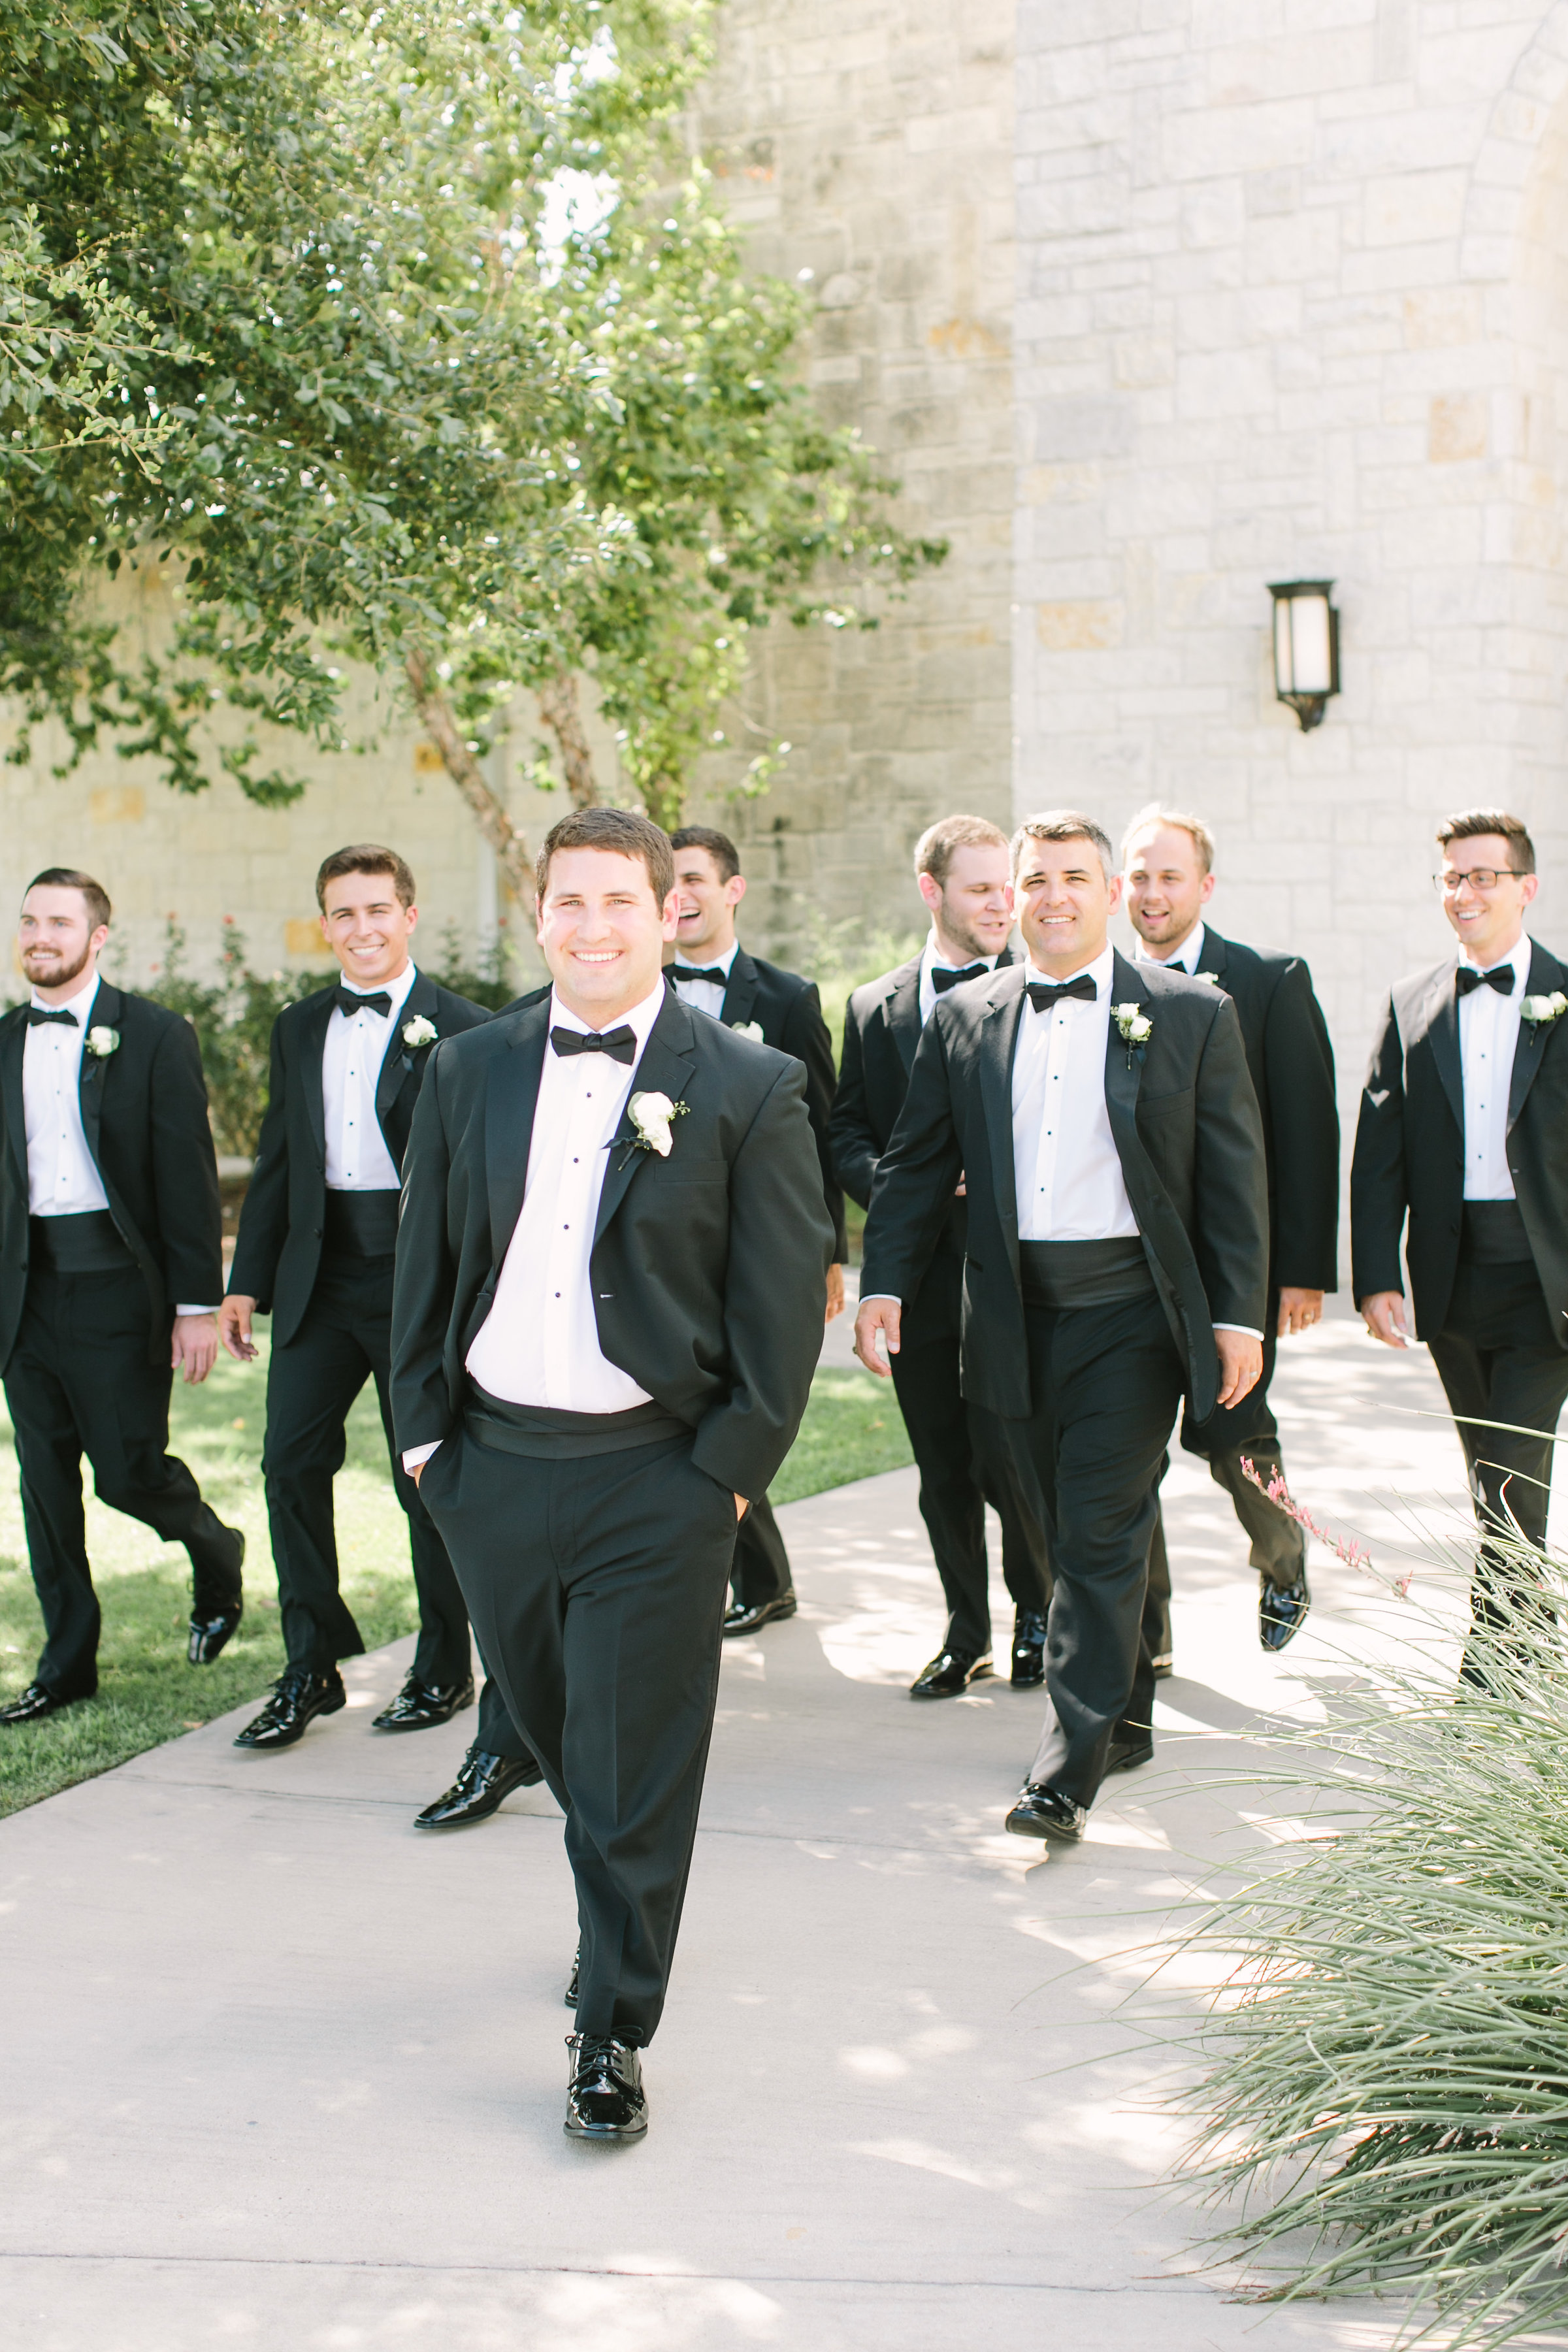 groomsmen-black-tux-white-simple-boutonniere-by-maxit-flower-design-in-houston-texas